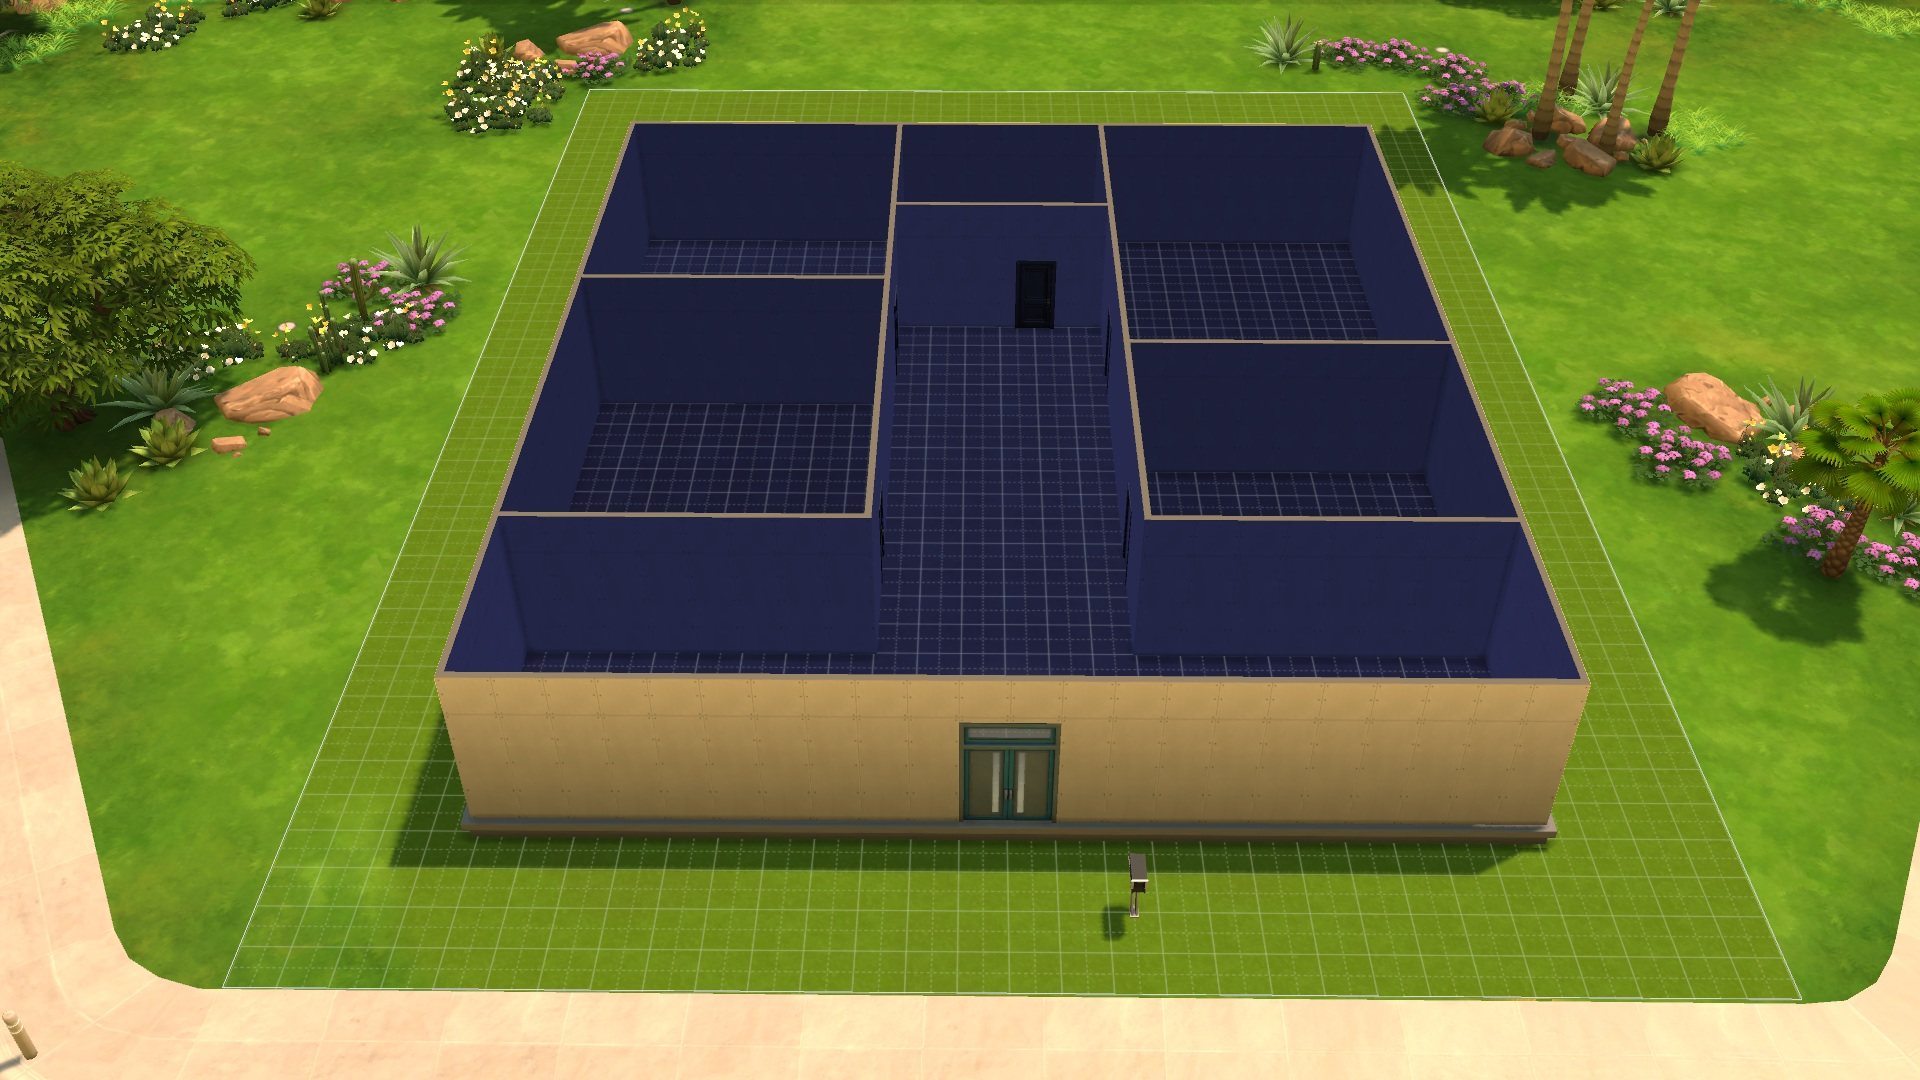 Les sims 4 construire sa maison 2 game guide for Simulation maison a construire